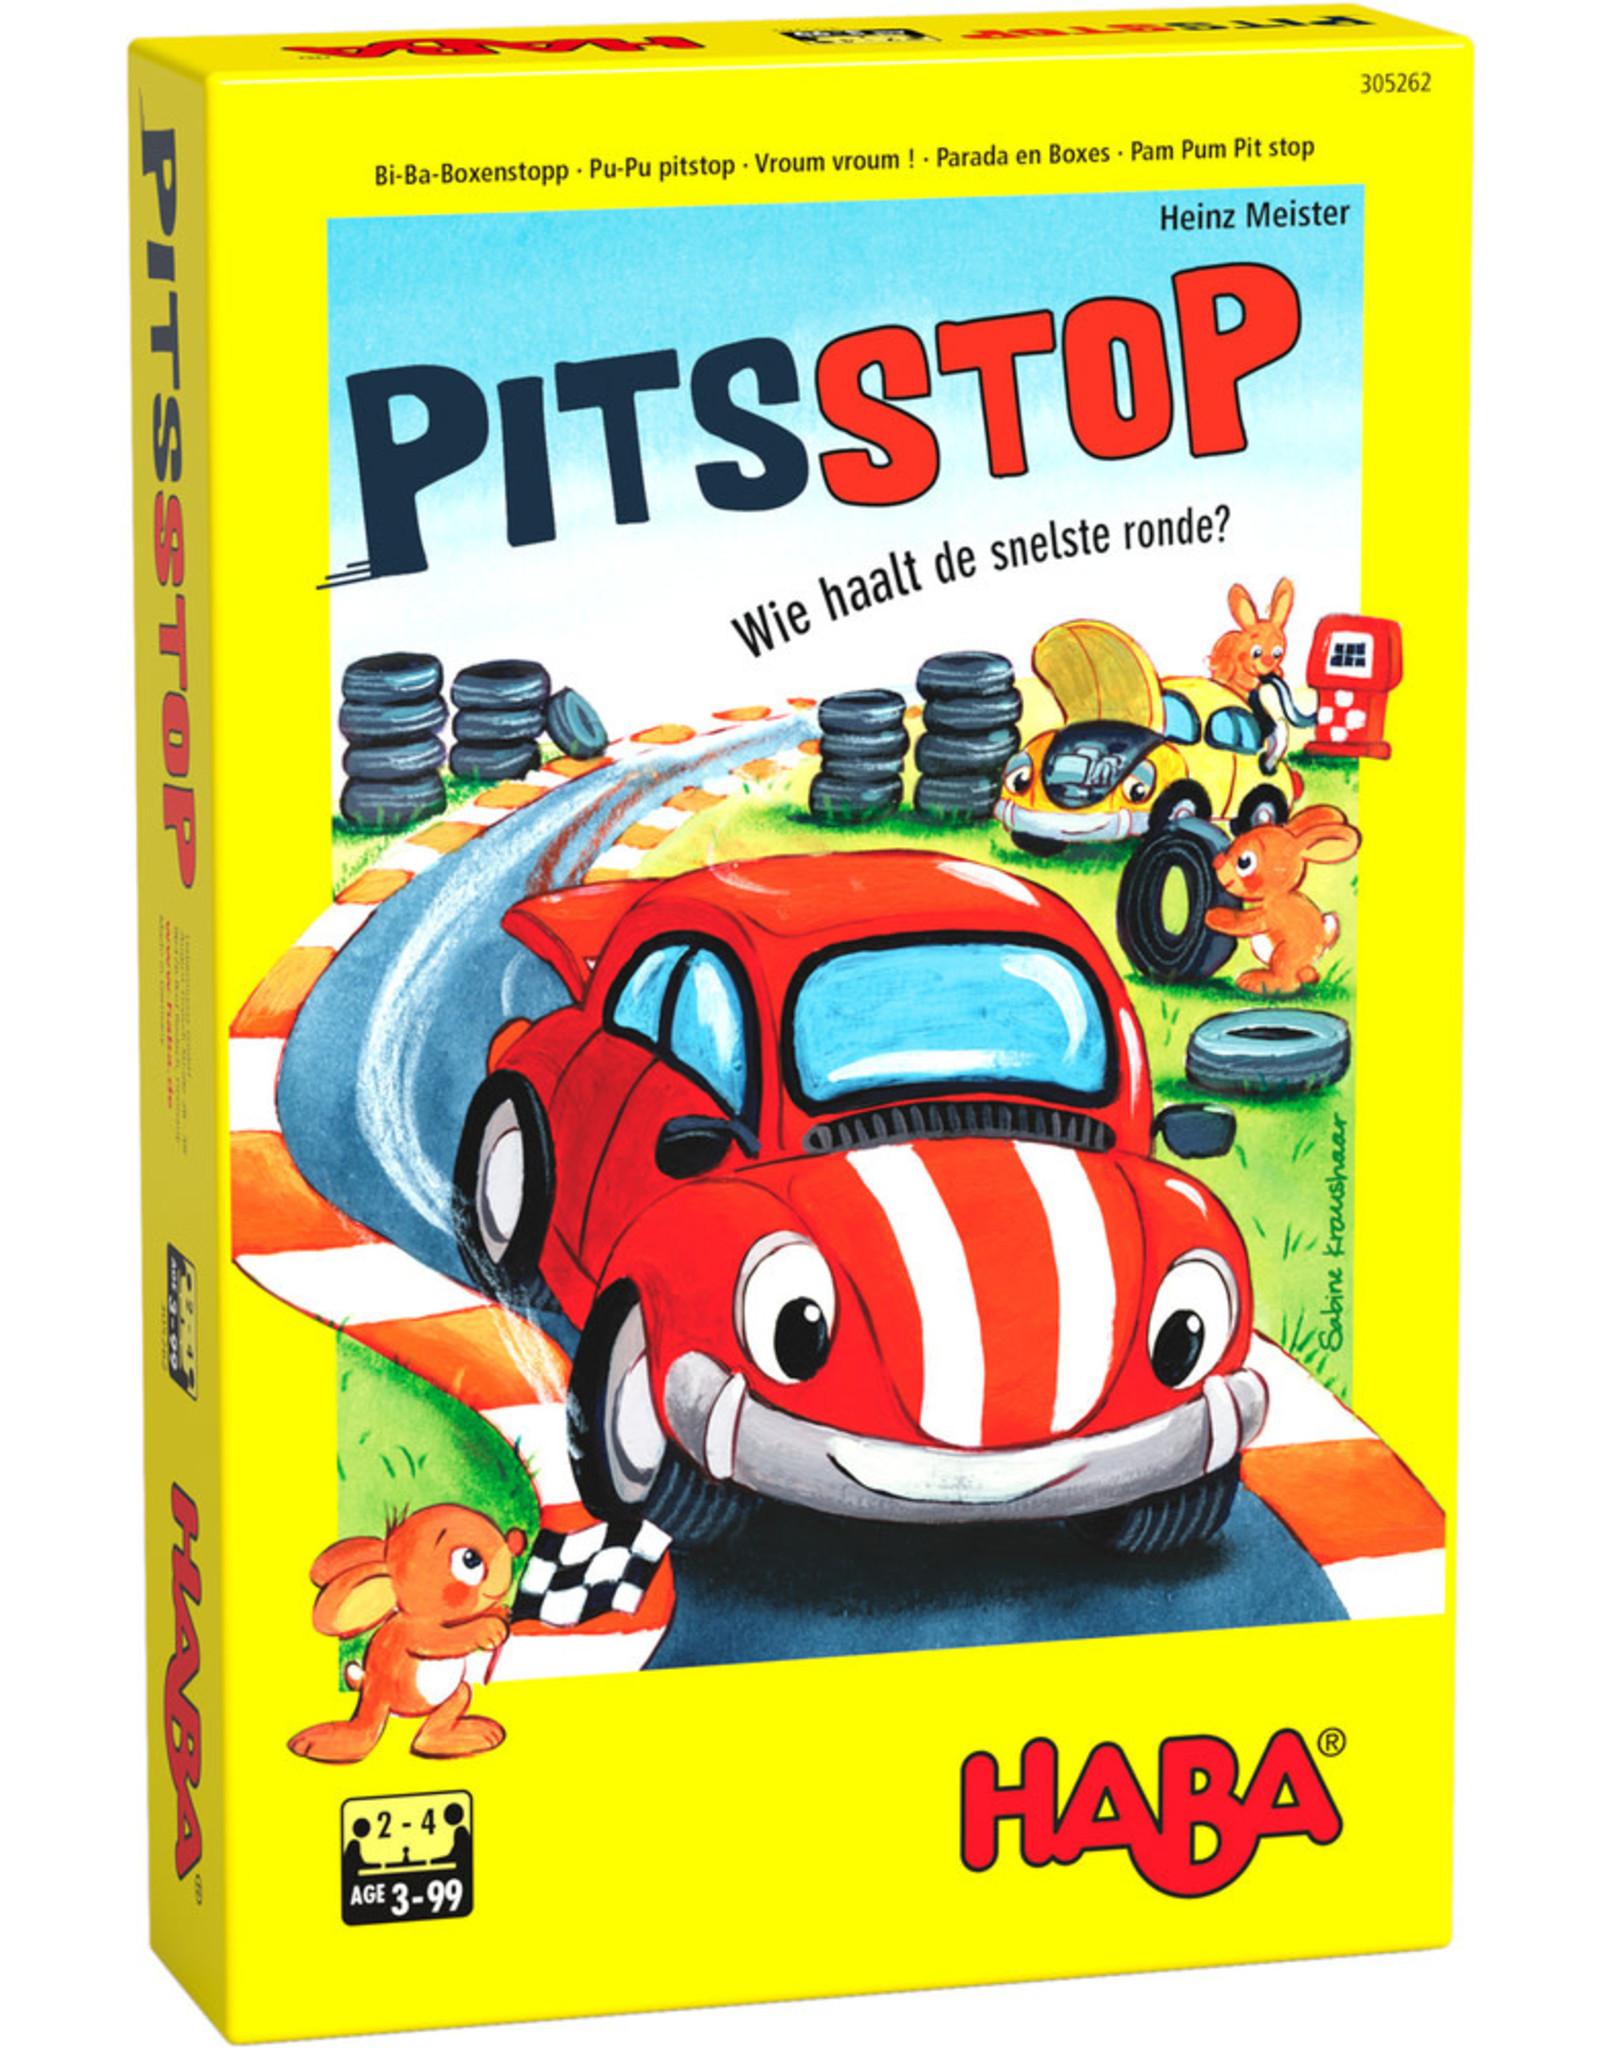 HABA Pitsstop